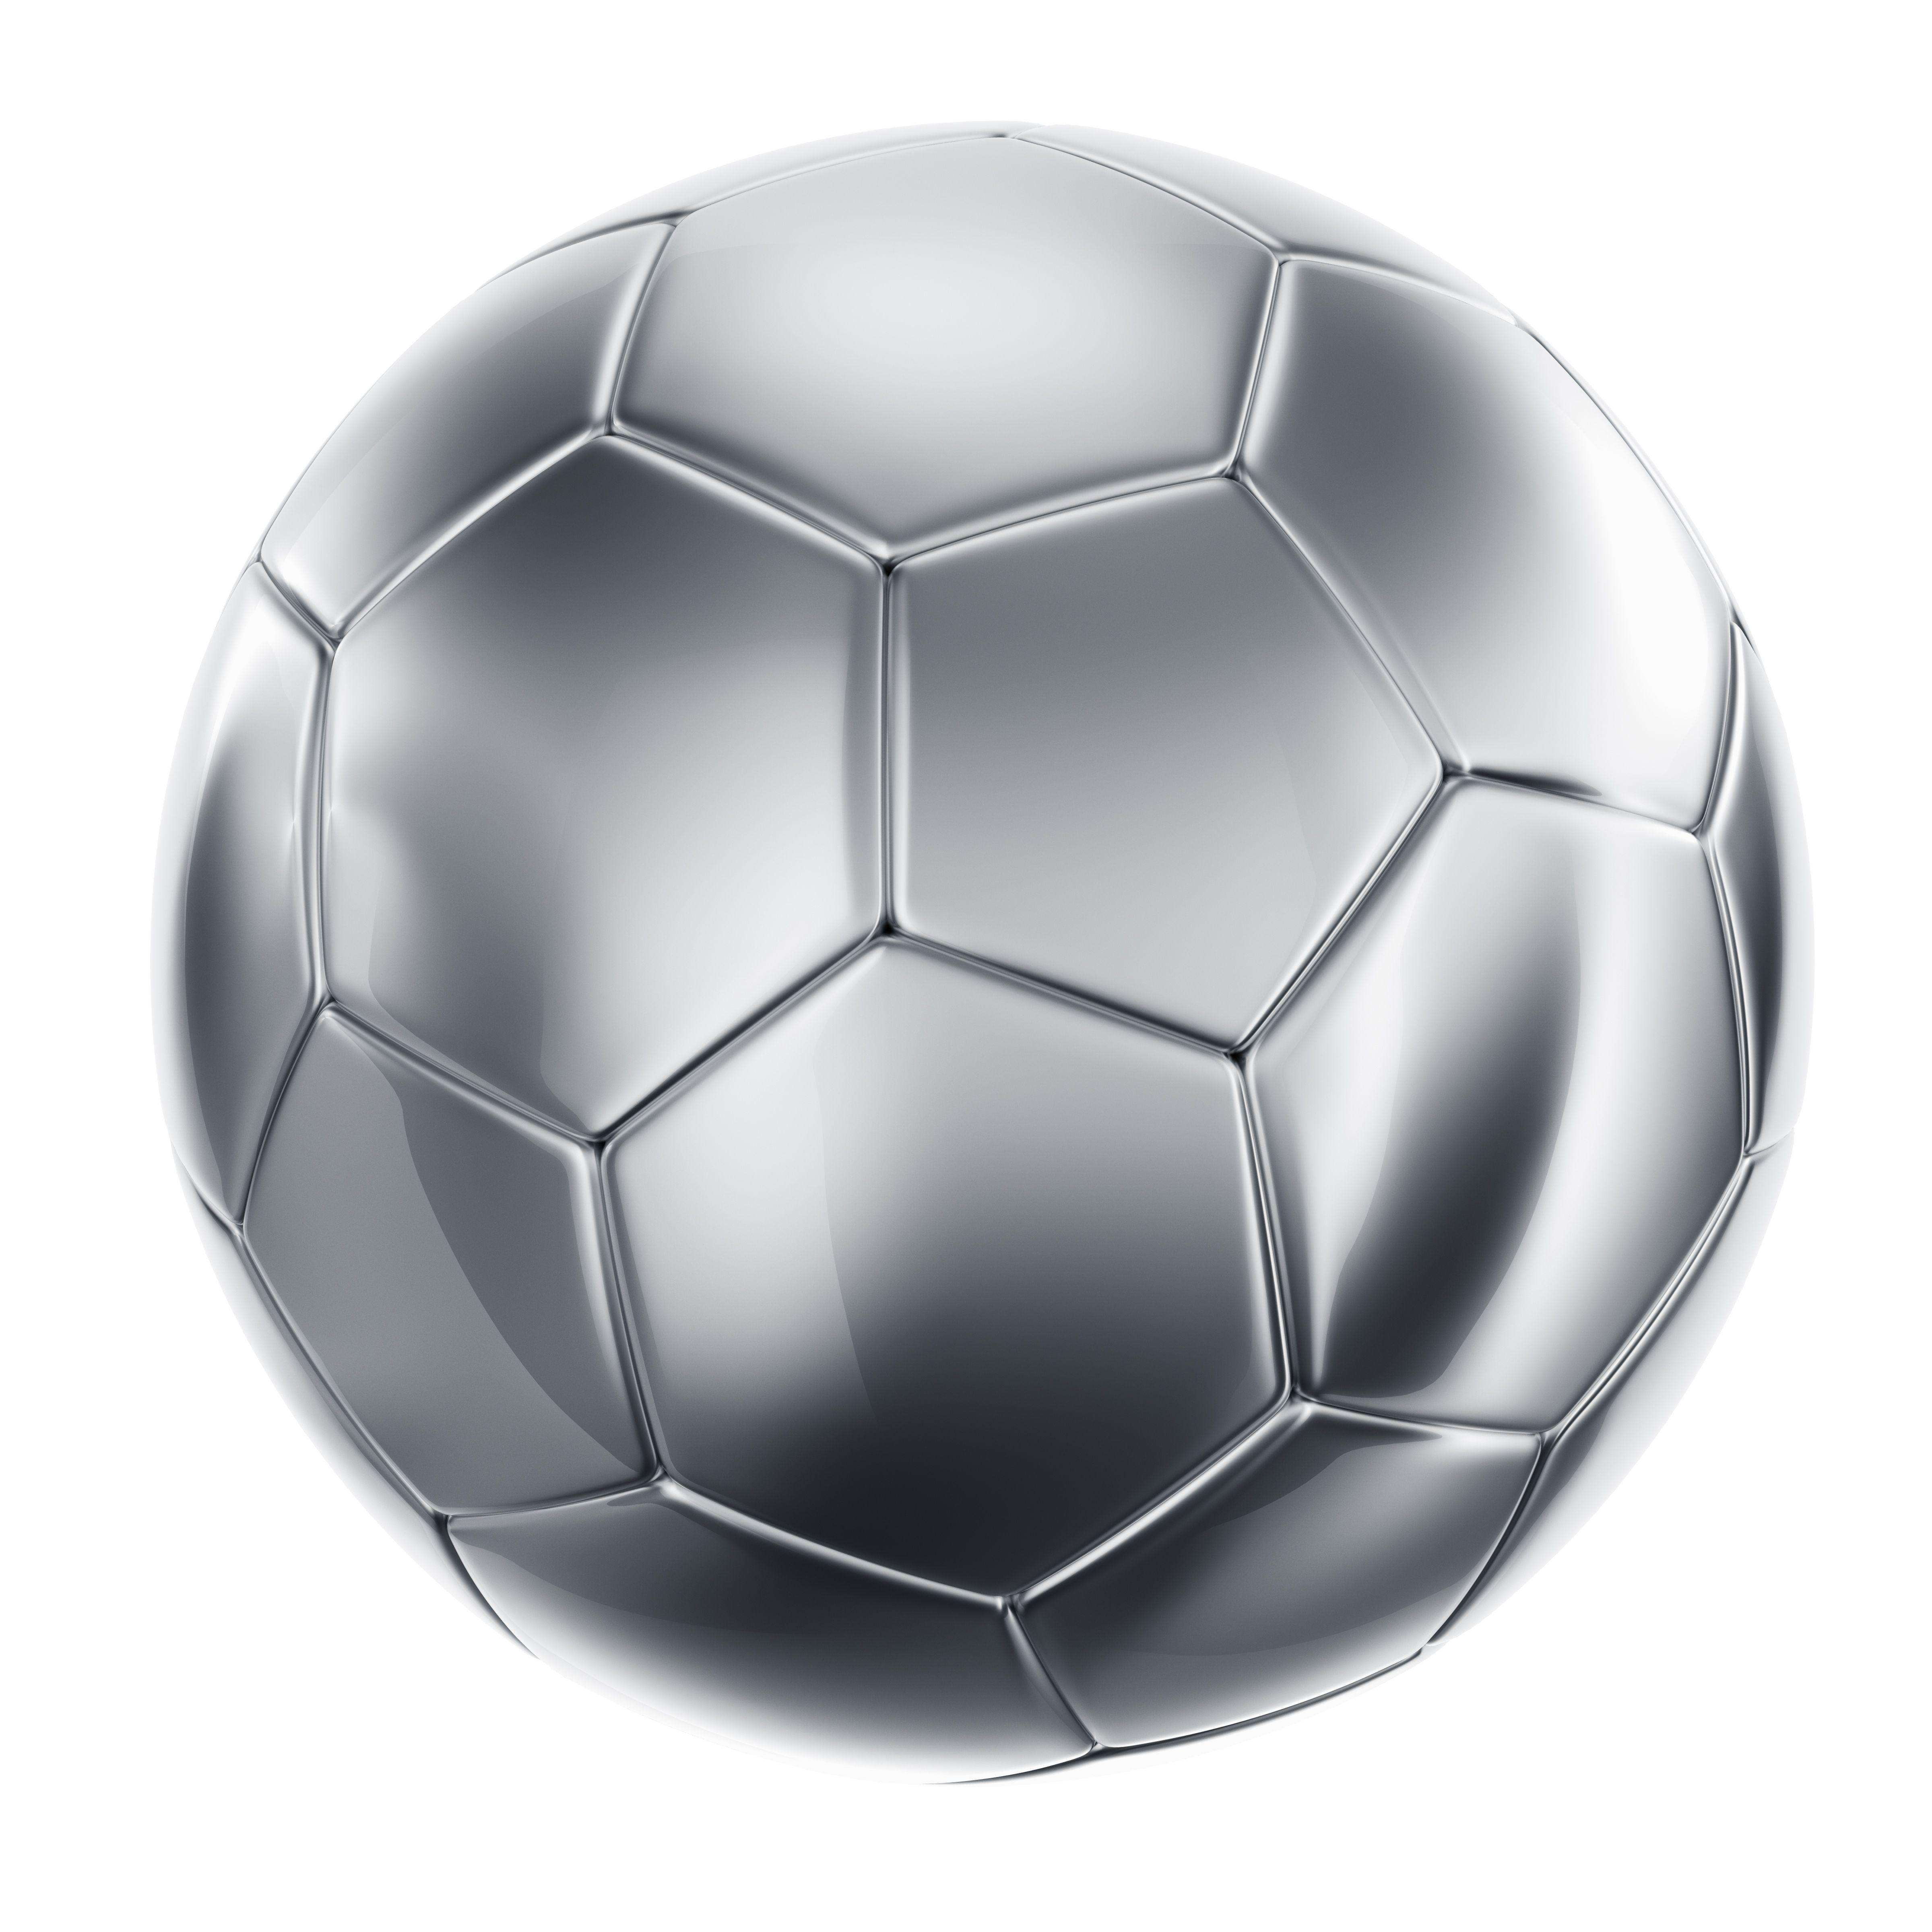 free vector earth 3d soccer ball highdefinition picture0015283D Object free vector earth 3d soccer ball highdefinition picture0015283D